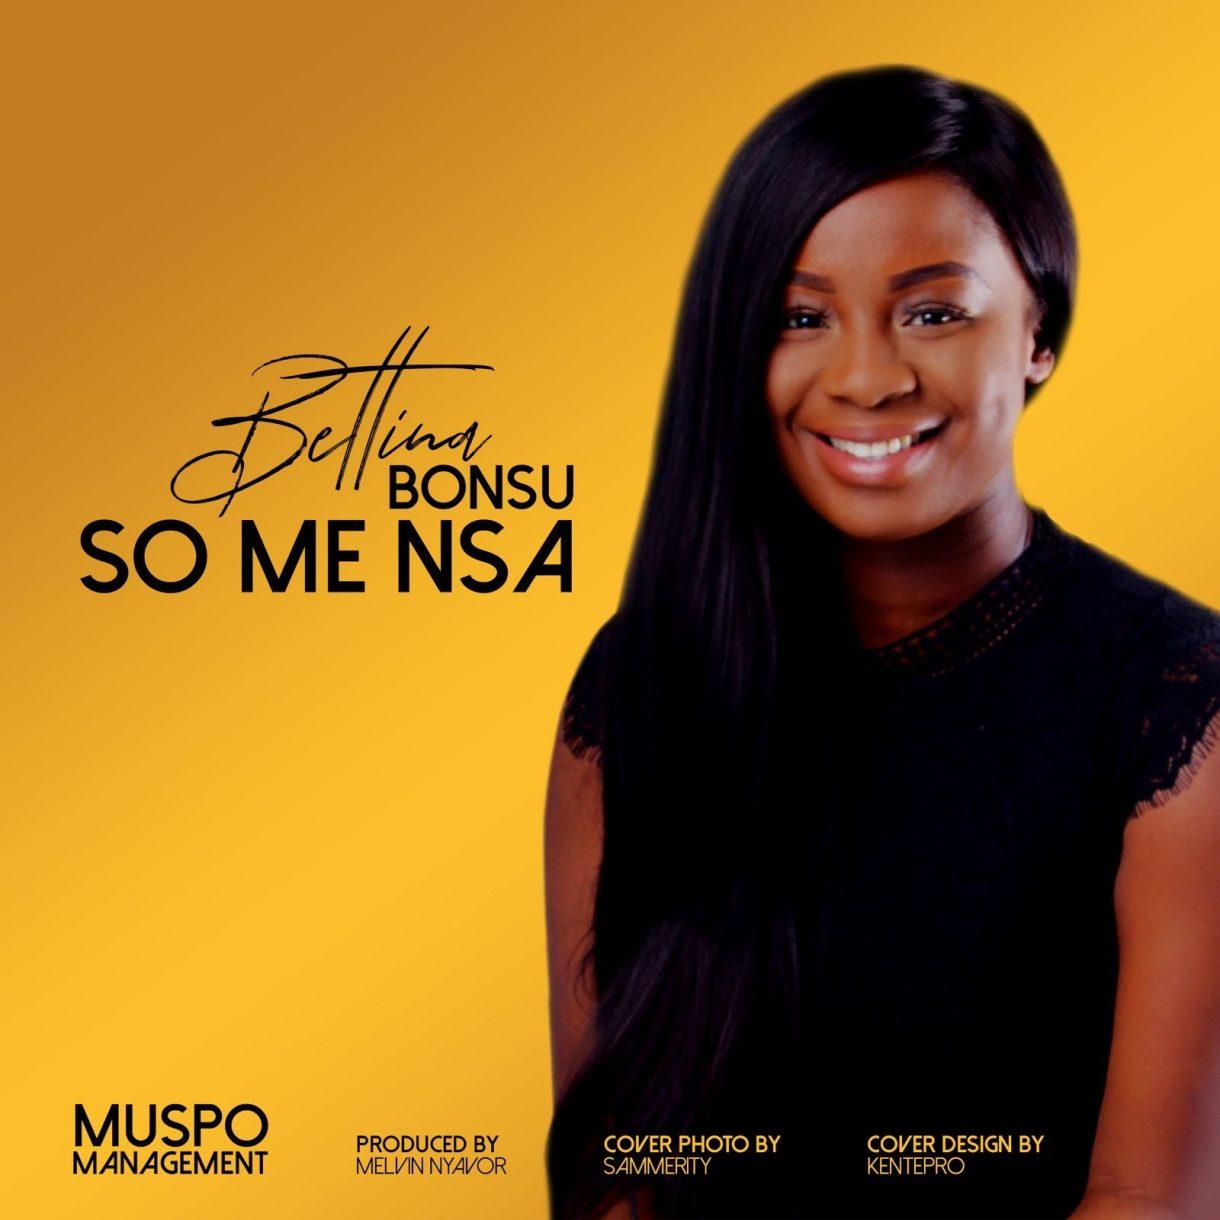 Bettina Bonsu - So Me Nsa (Prod. By Melvin Nyavor)